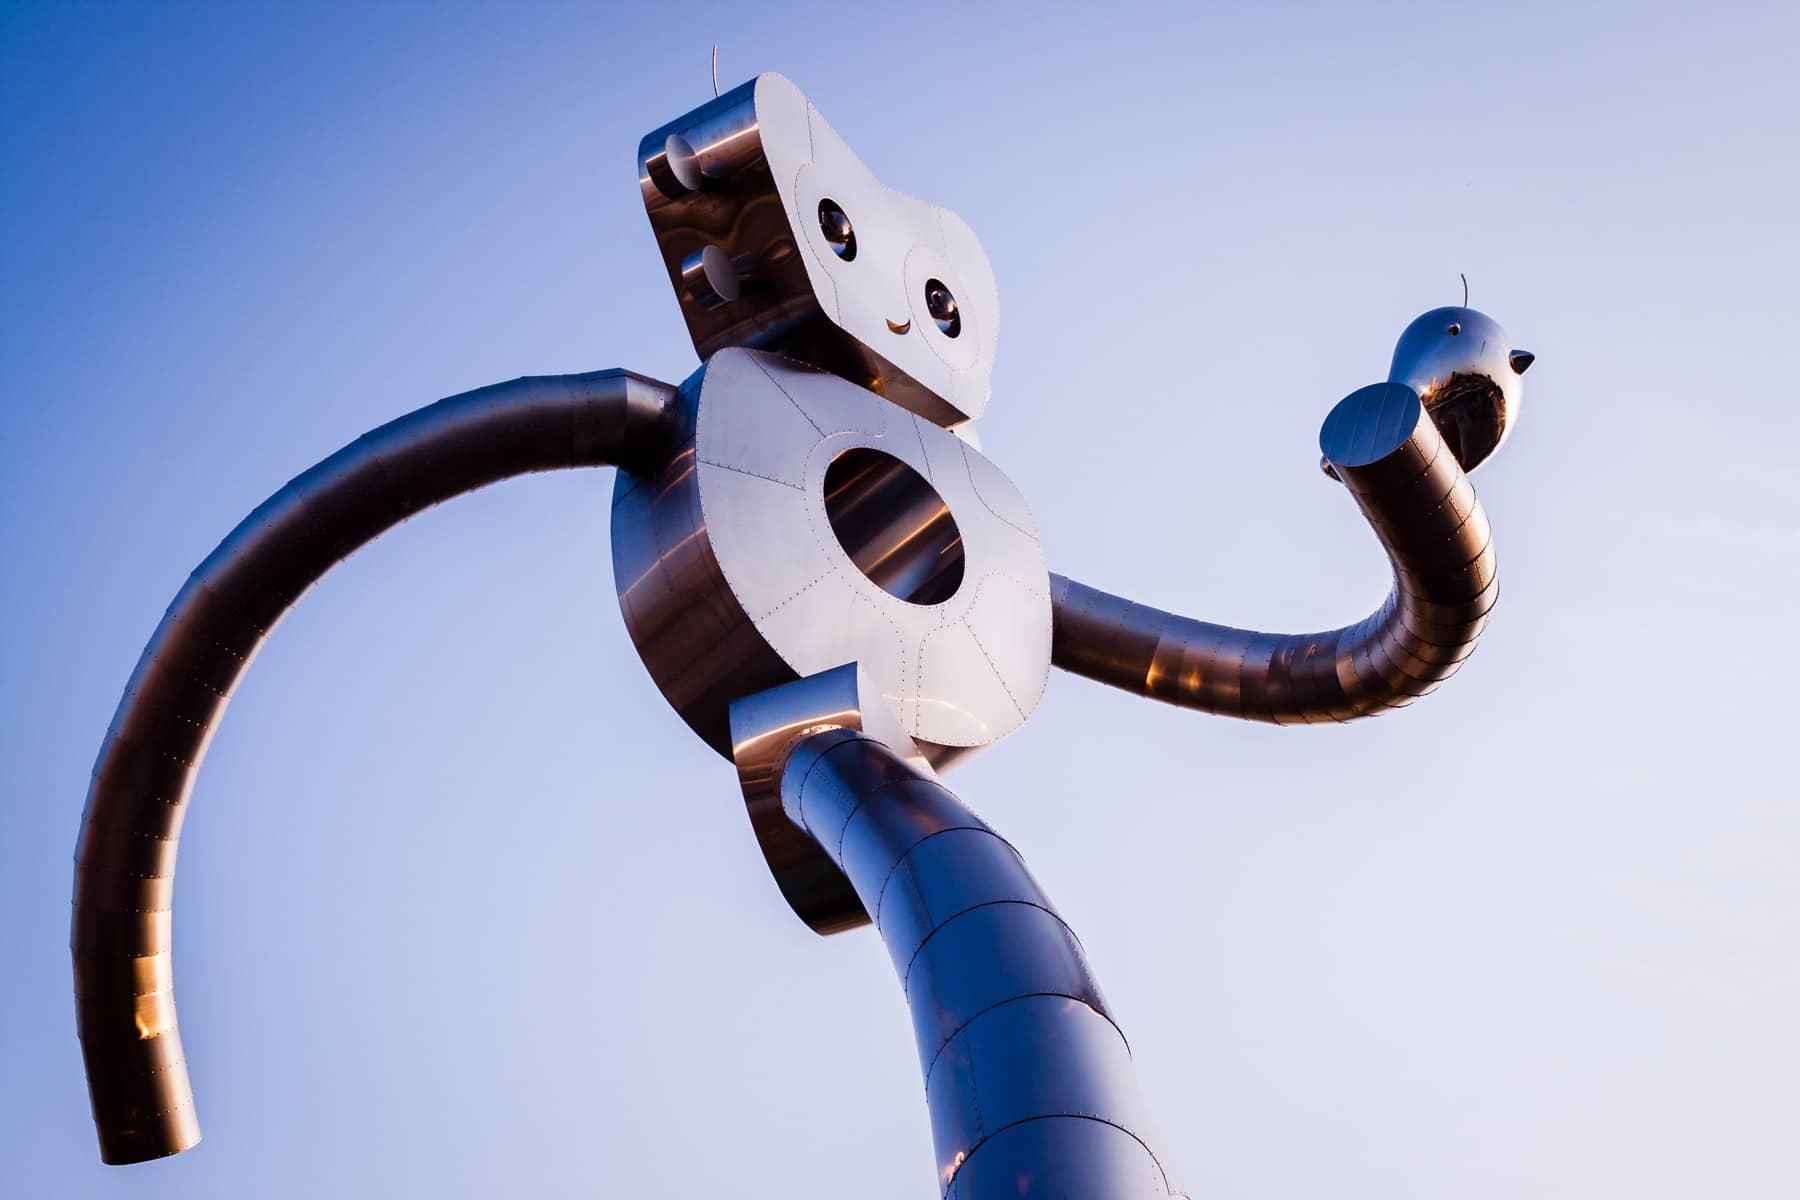 Deep Ellum's Traveling Man sculpture, Dallas.